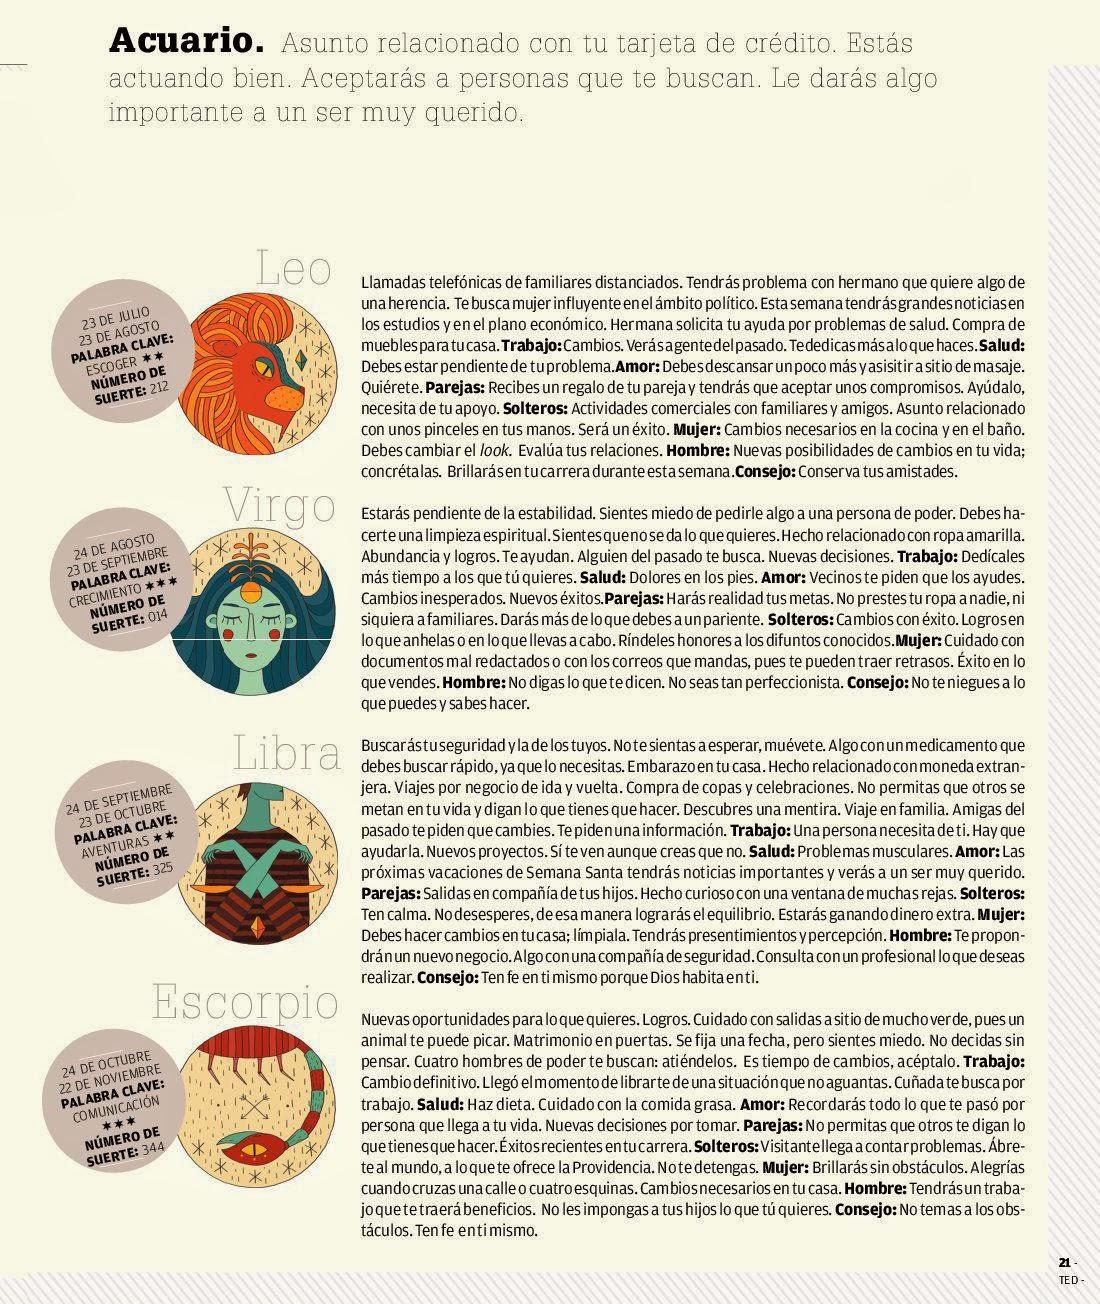 ... , Libra, escorpio del 16 al 22 de febrero de 2014 Adriana Azzi Sedes